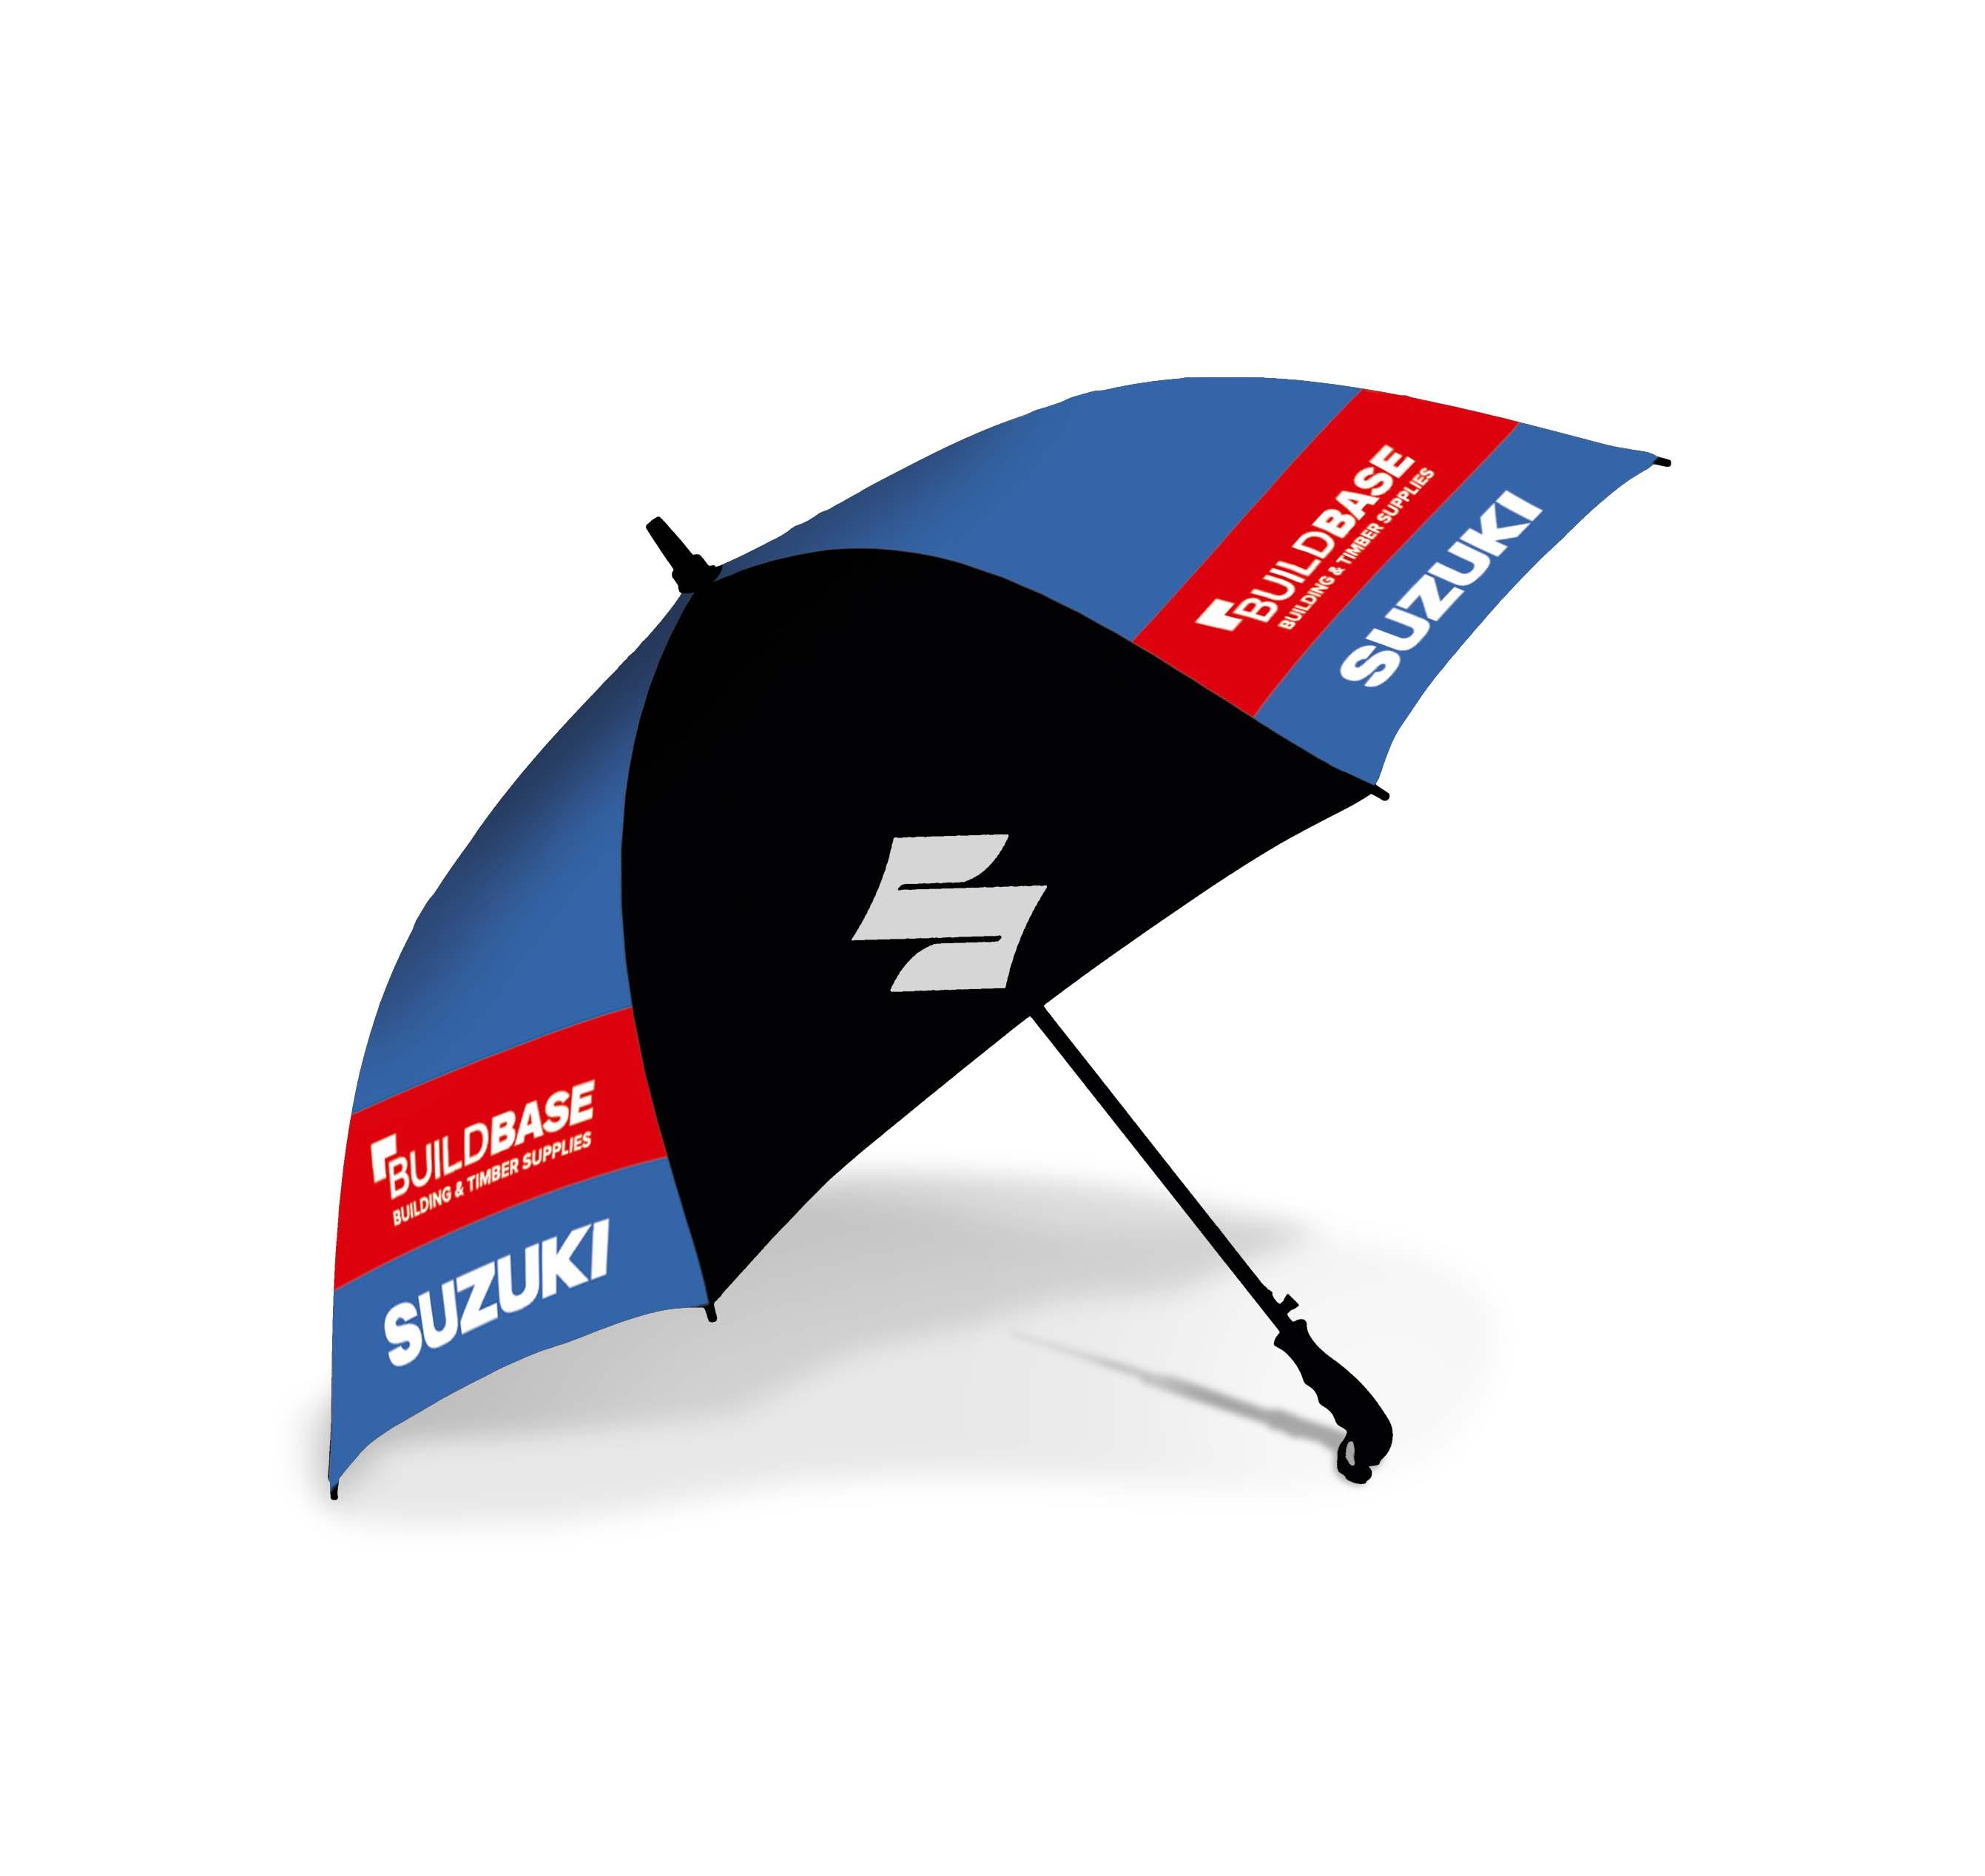 Genuine Suzuki Buildbase Suzuki BSB 2019 Umbrella 990F0-B3UMB-000